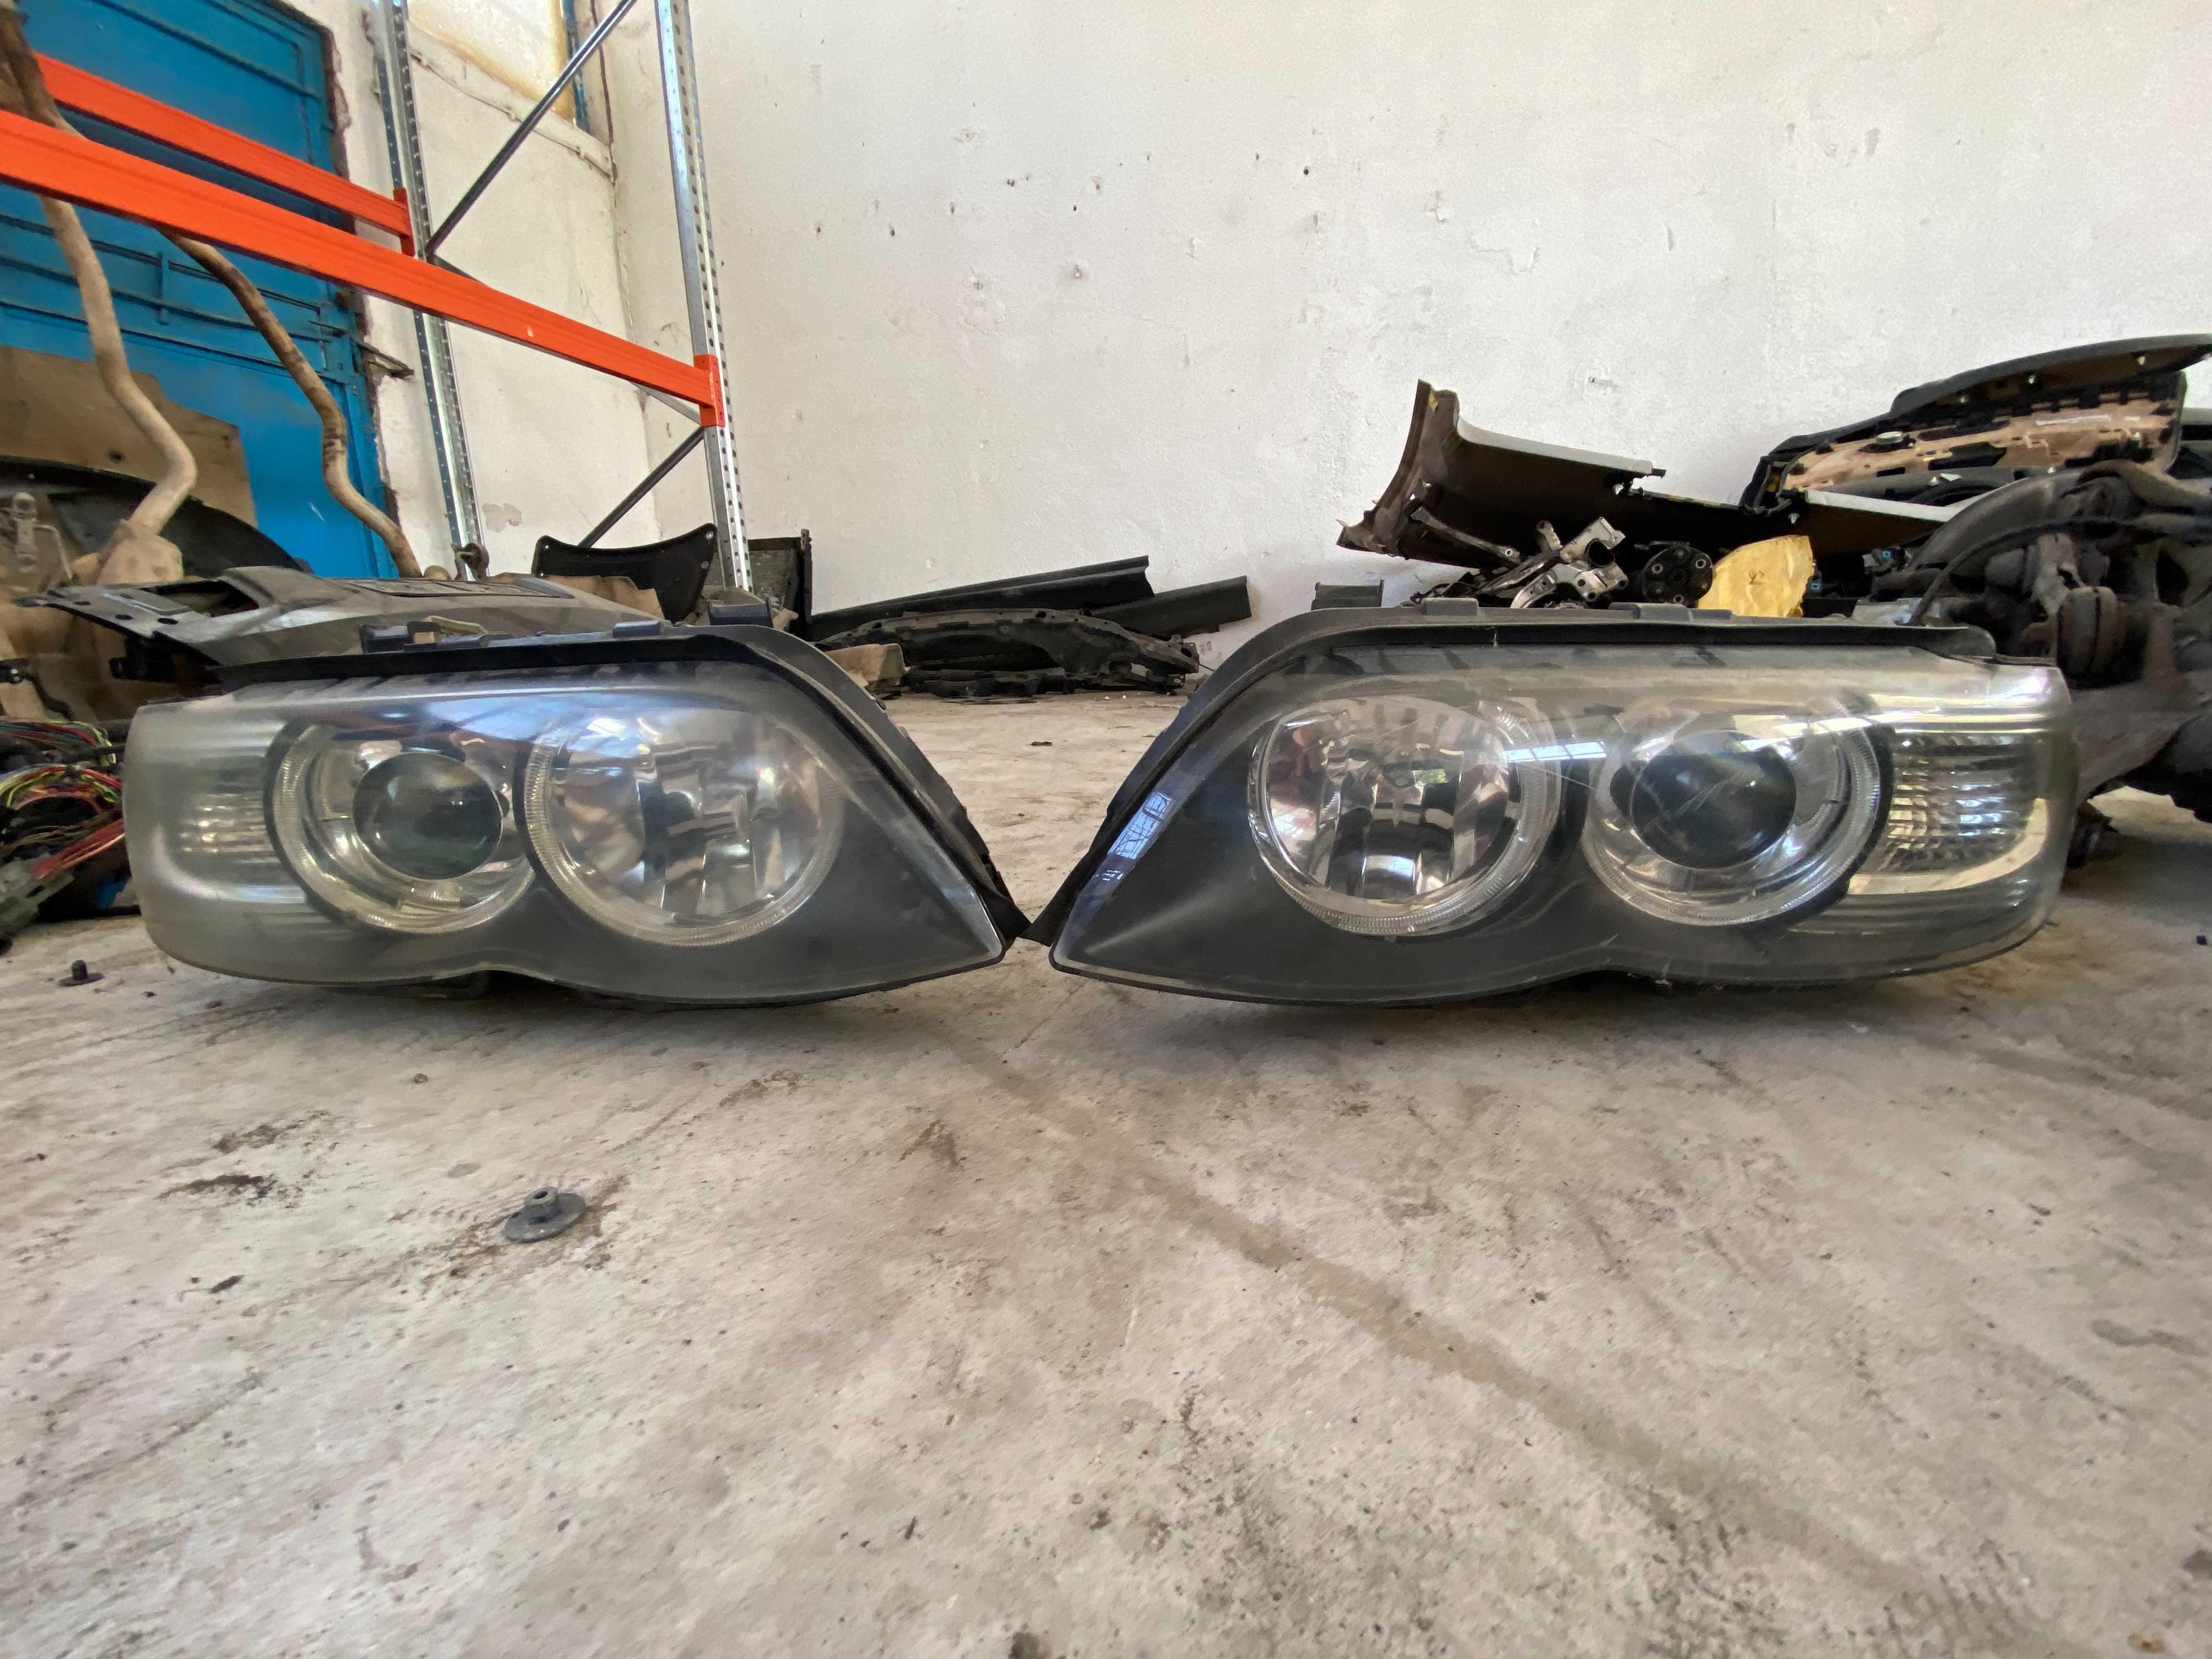 Фарове - /БМВ/BMW/ - /е53 /x5/ - M57- 3.0D - 218кс